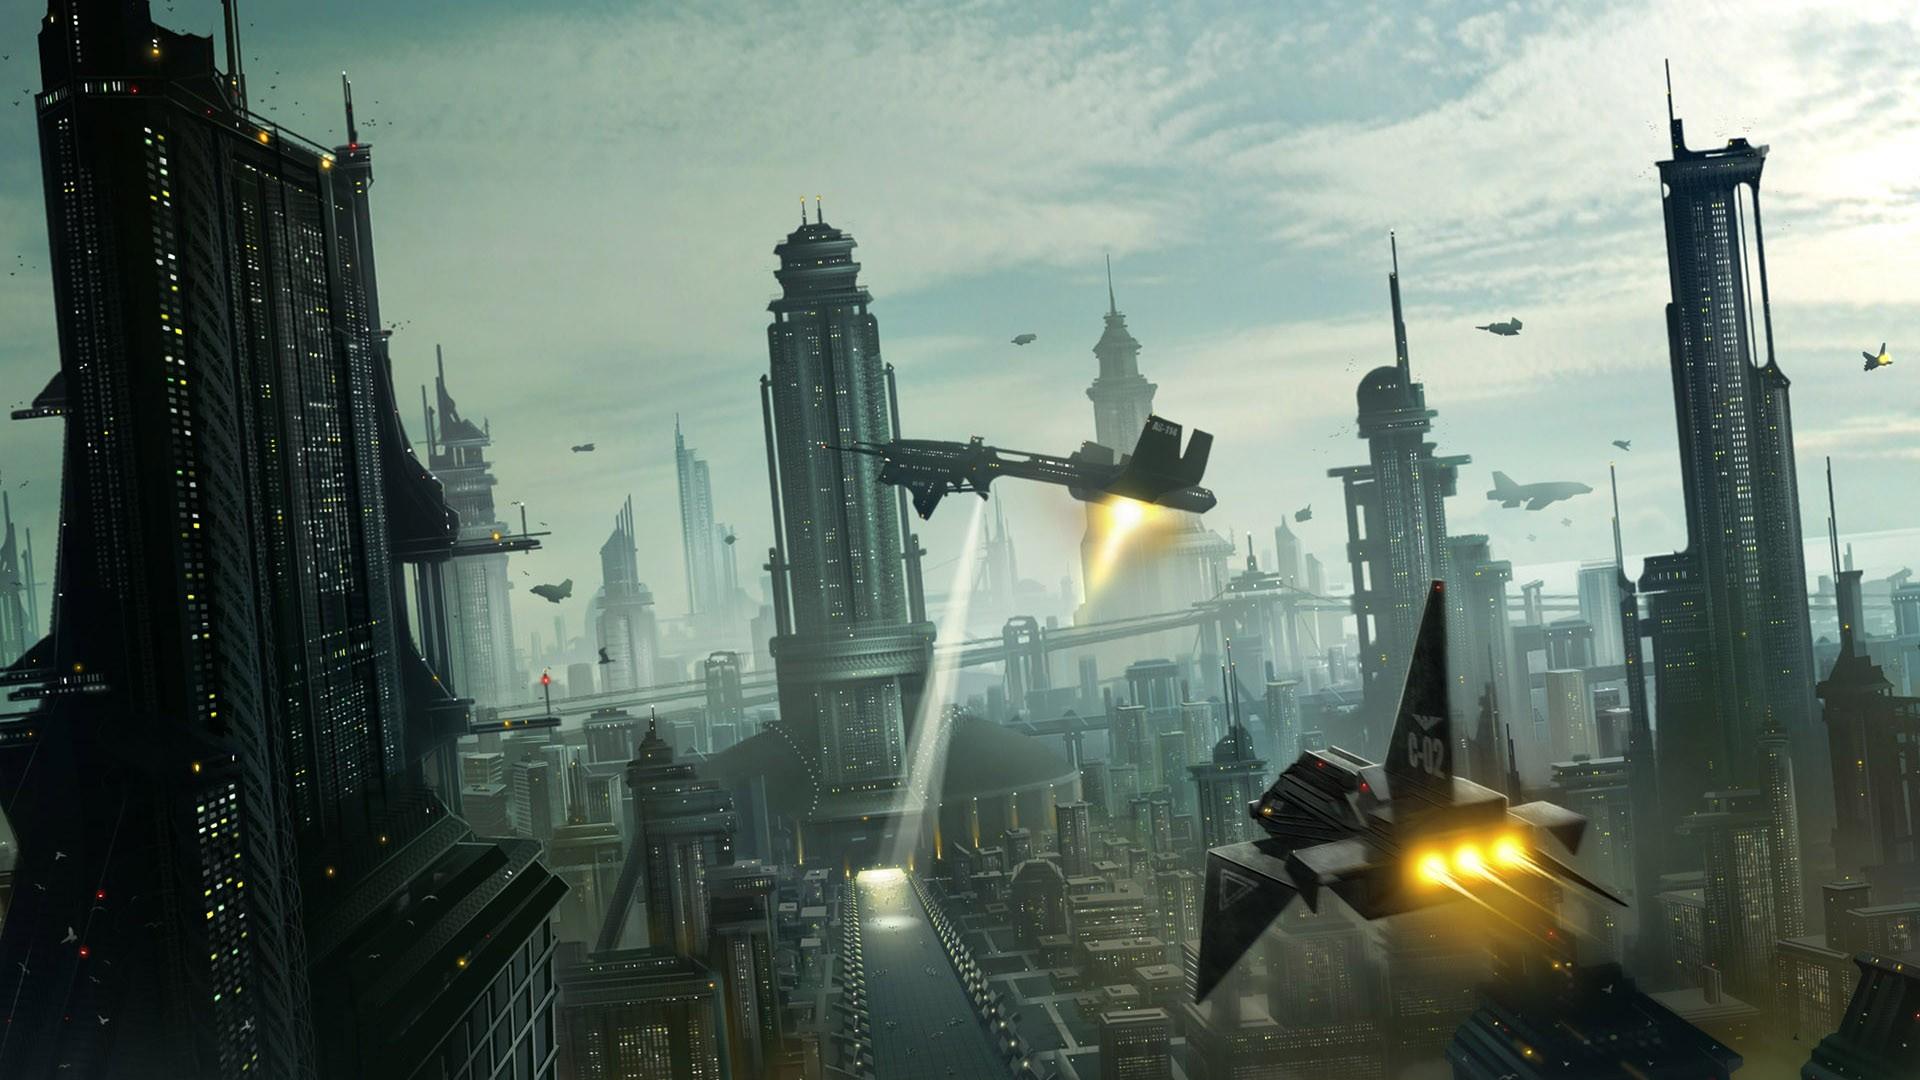 General 1920x1080 futuristic spaceship science fiction aircraft digital art futuristic city cityscape